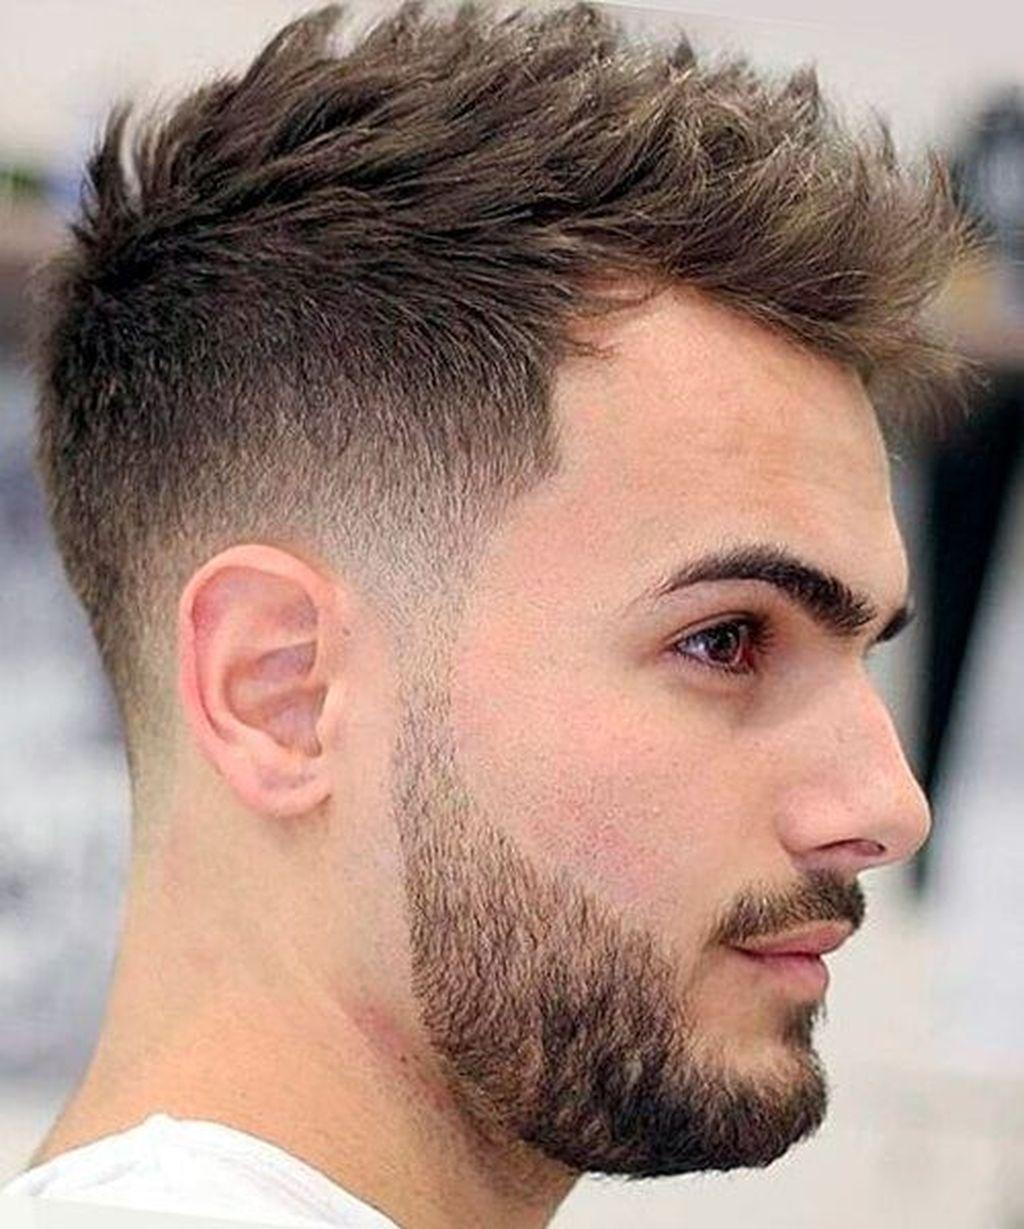 34 Trendy Haircut Ideas For Men This Year 2020 Kapsels Voor Mannen Kapsels Mannen Herenkapsels